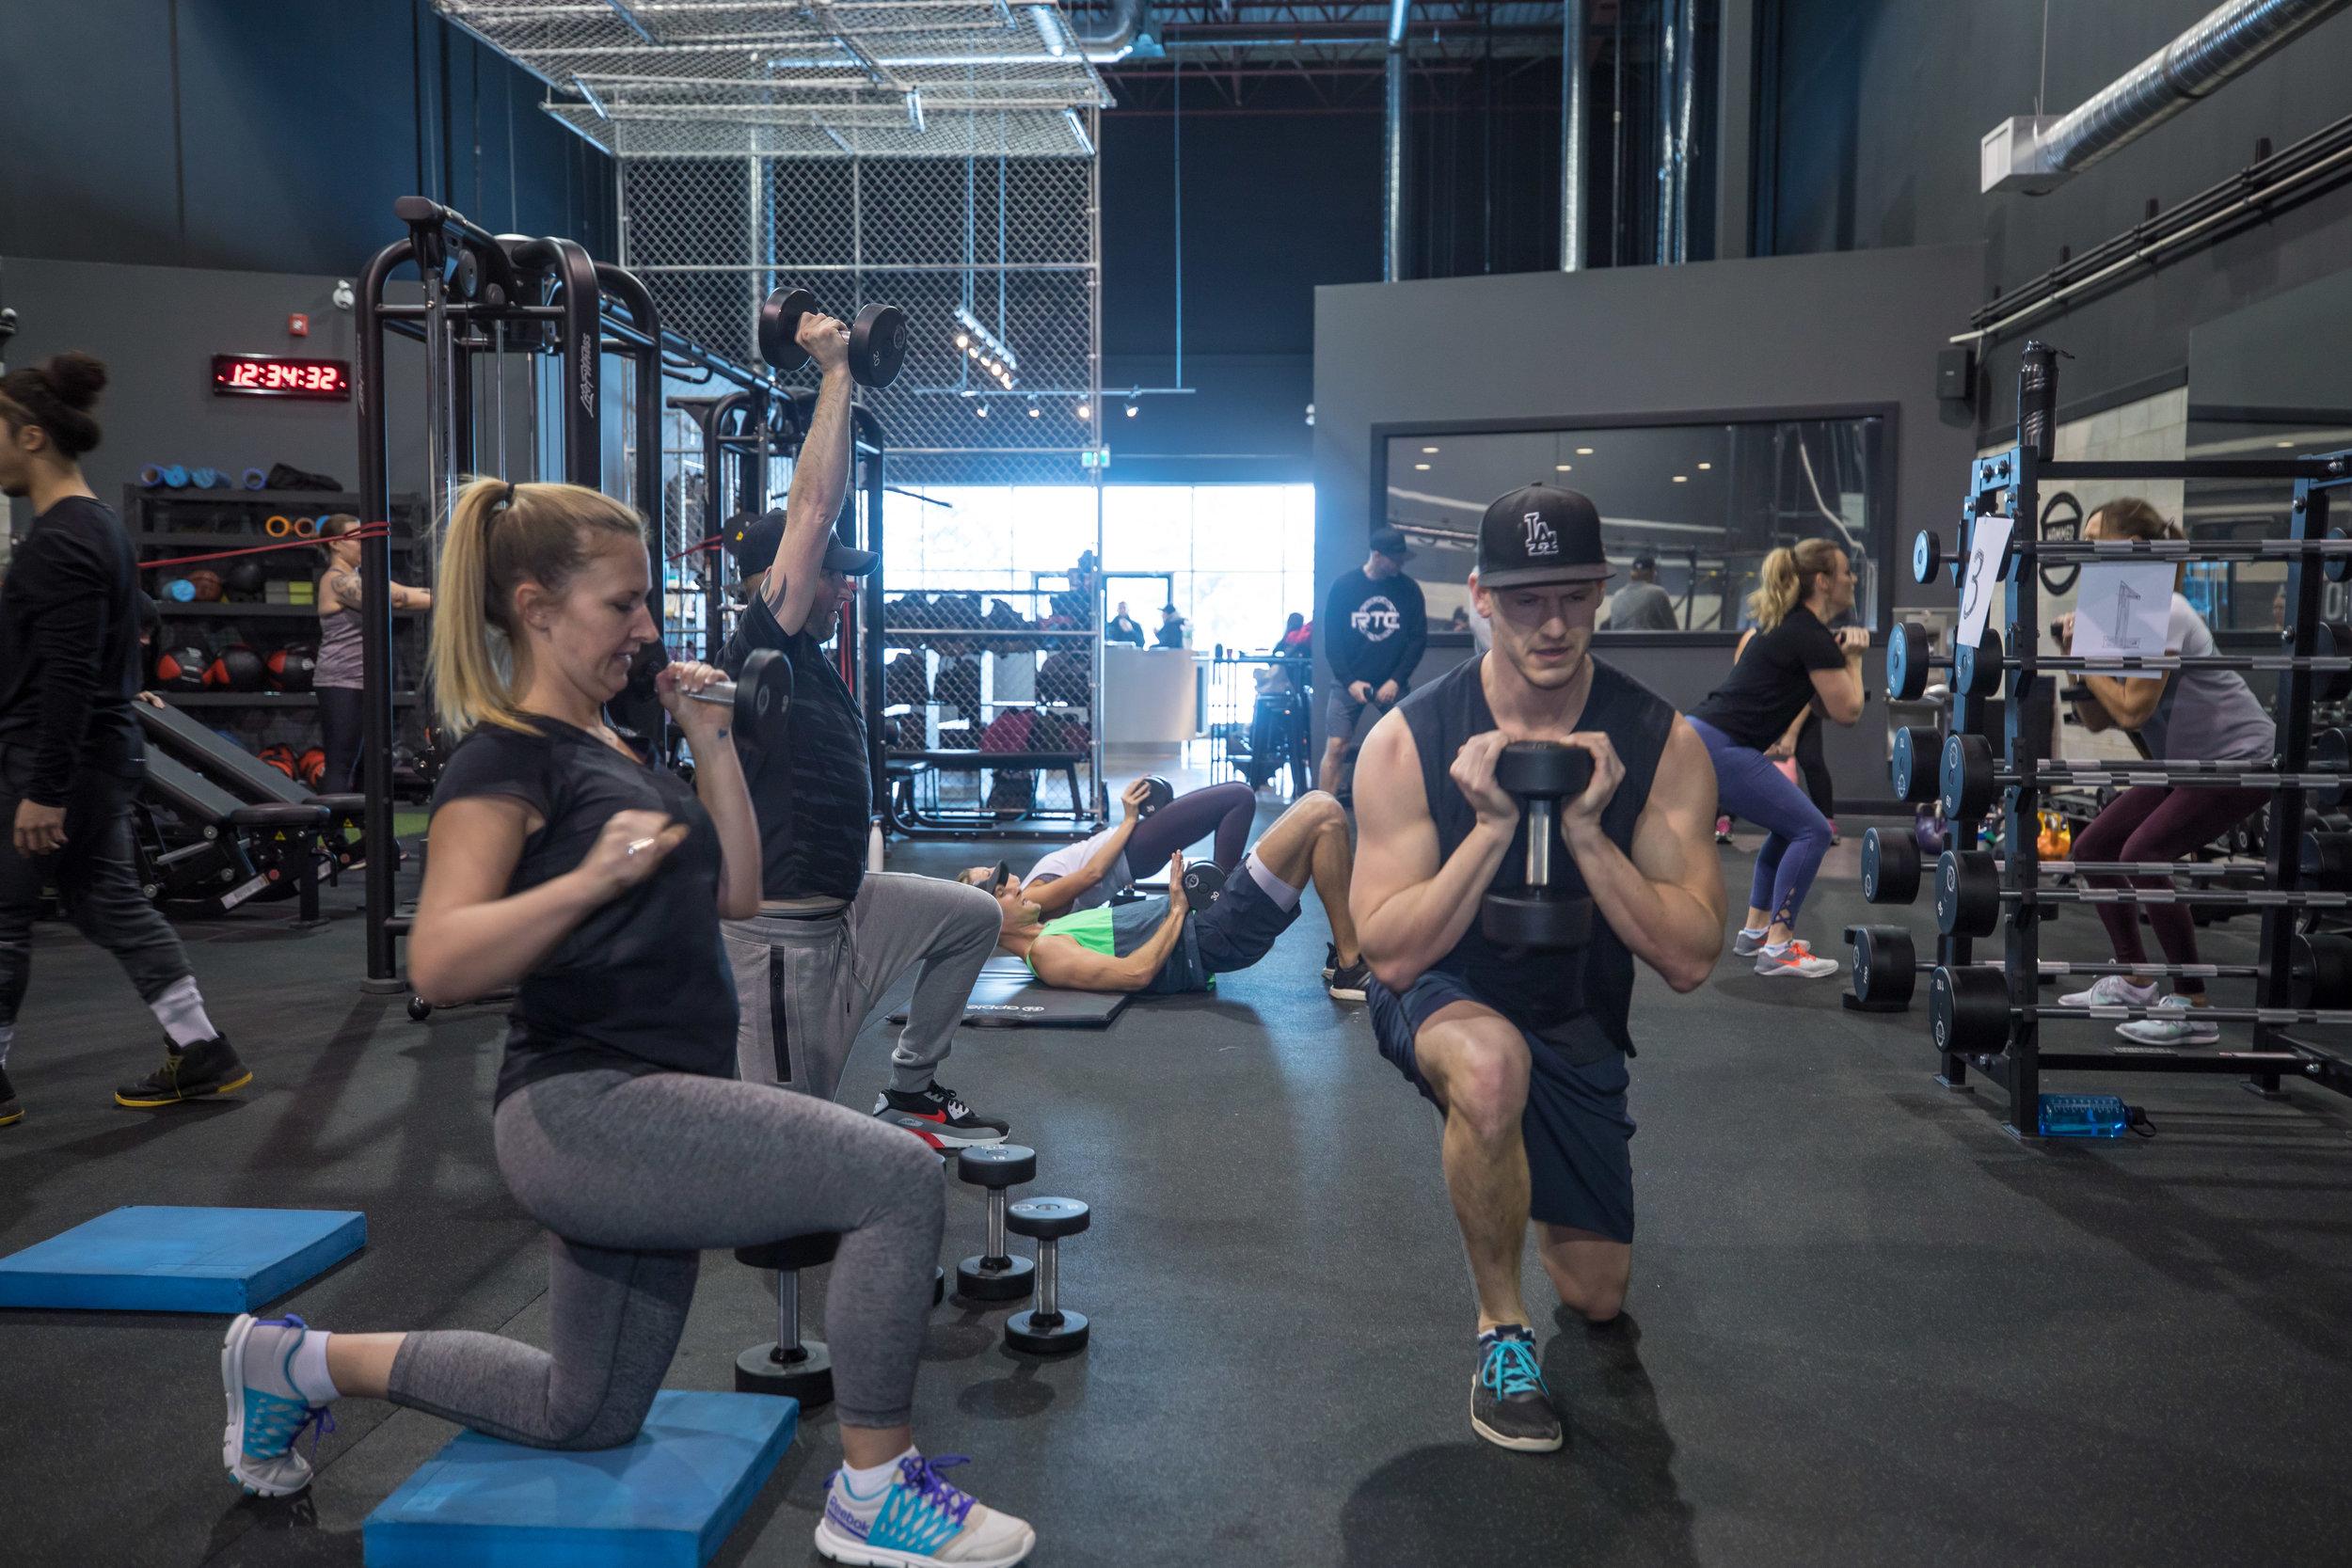 2019 02-02 Renegade Training Company - Calgary 366.jpg